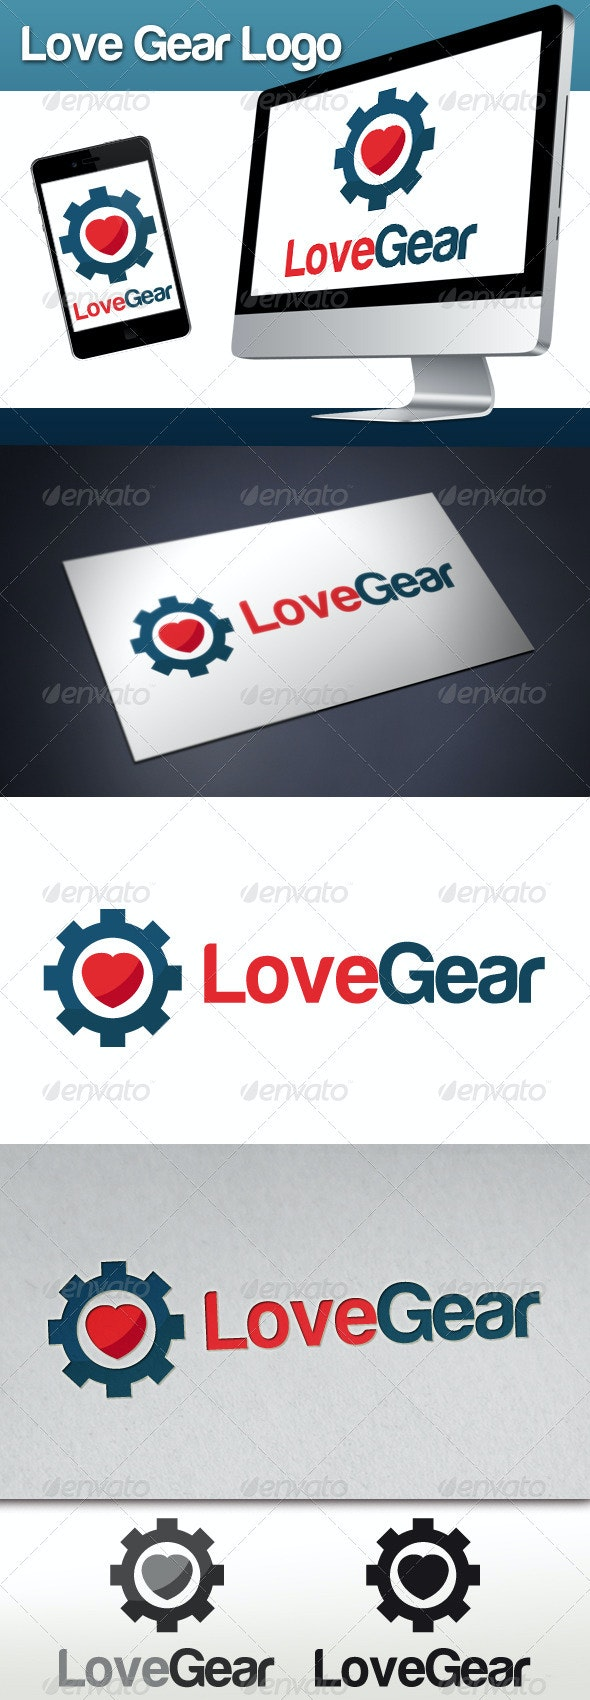 Love Gear Logo - Objects Logo Templates